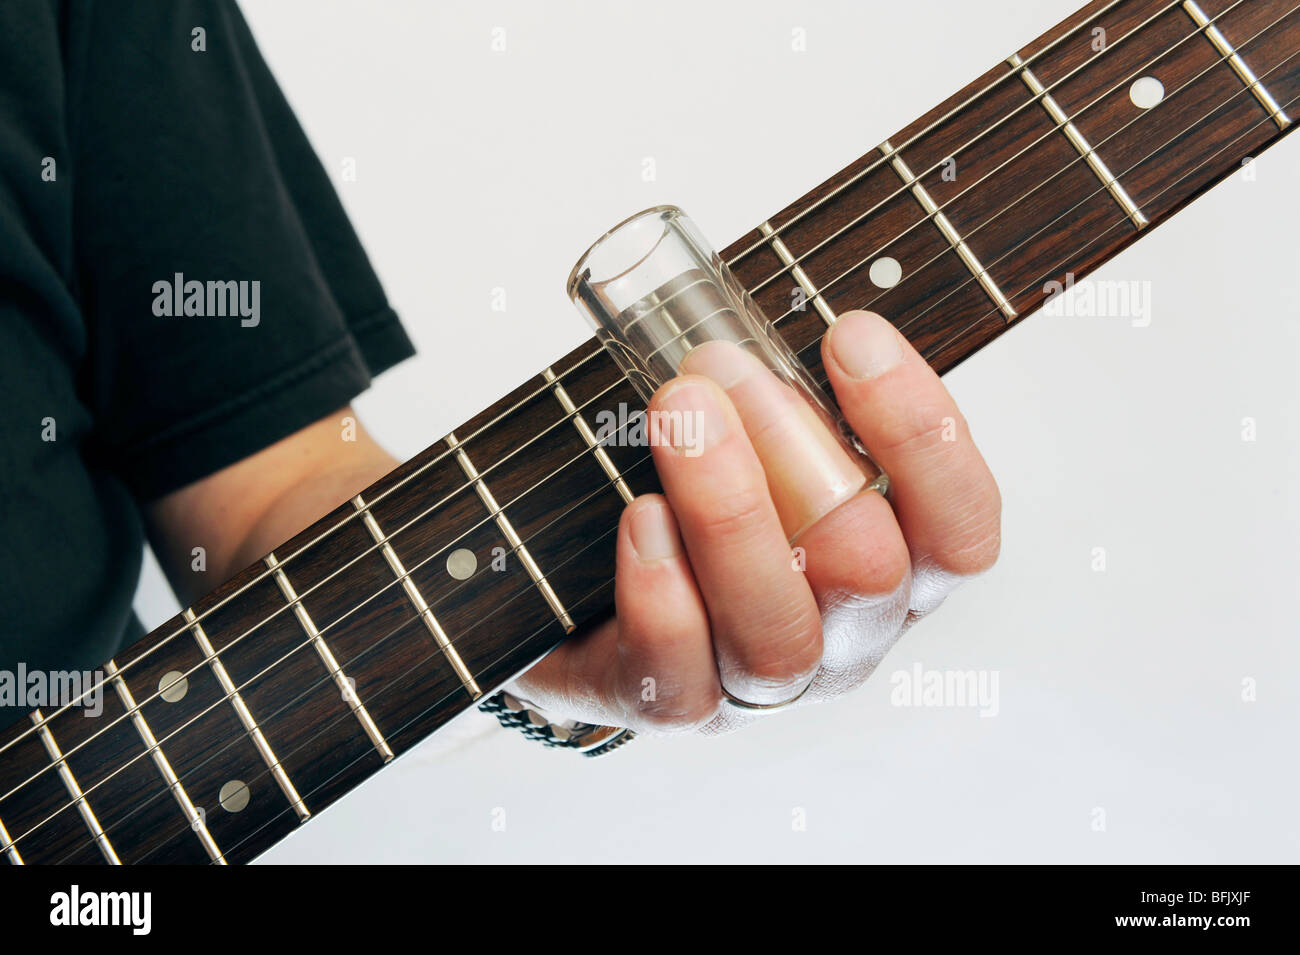 a mans hand demonstrates a bottle neck glass guitar slide against a guitar neck - Stock Image